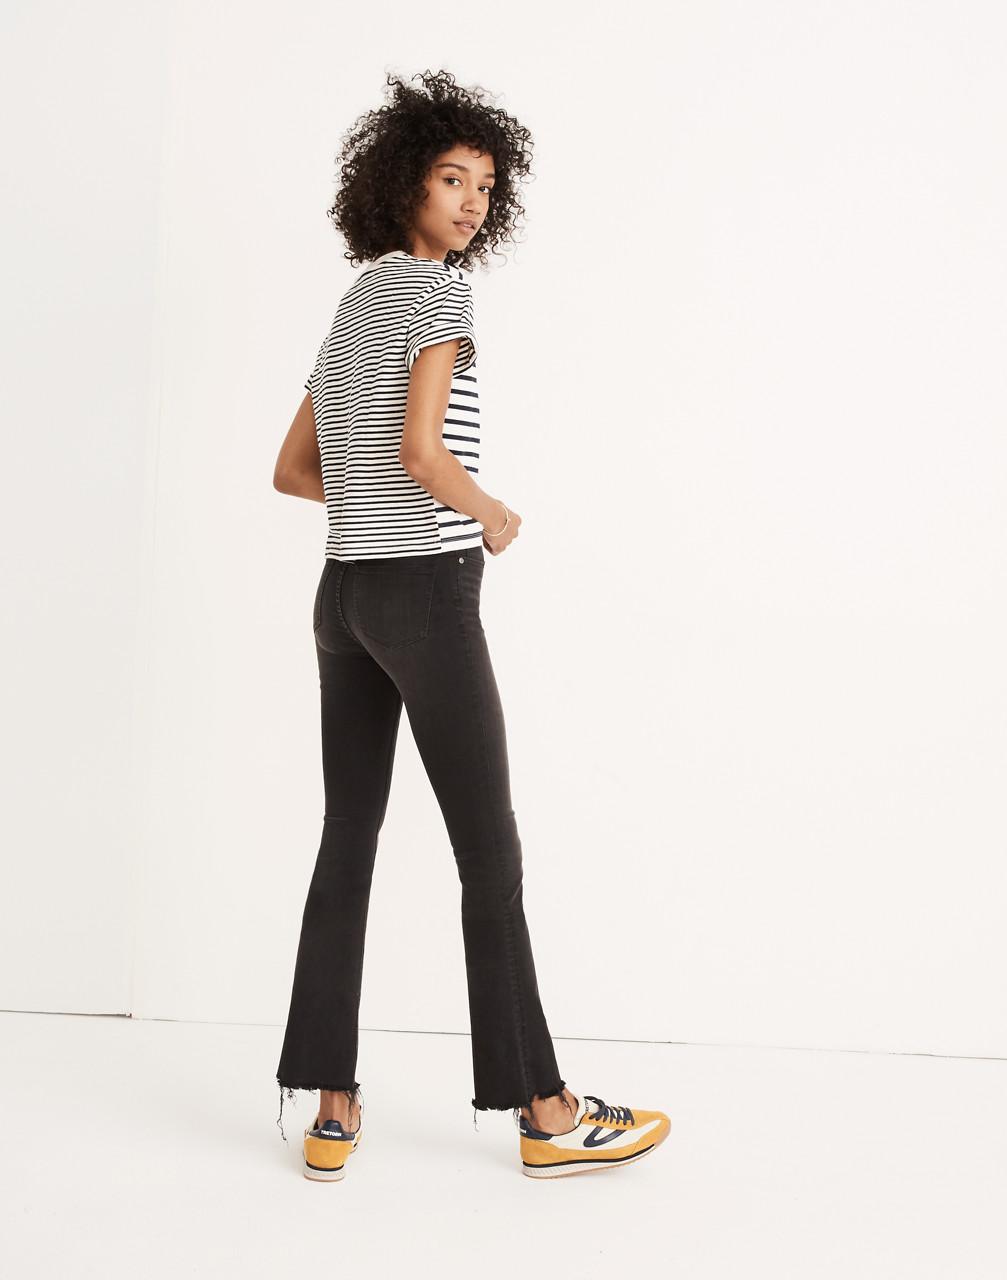 Cali Demi-Boot Jeans in Berkeley Black: Chewed-Hem Edition in berkeley wash image 2